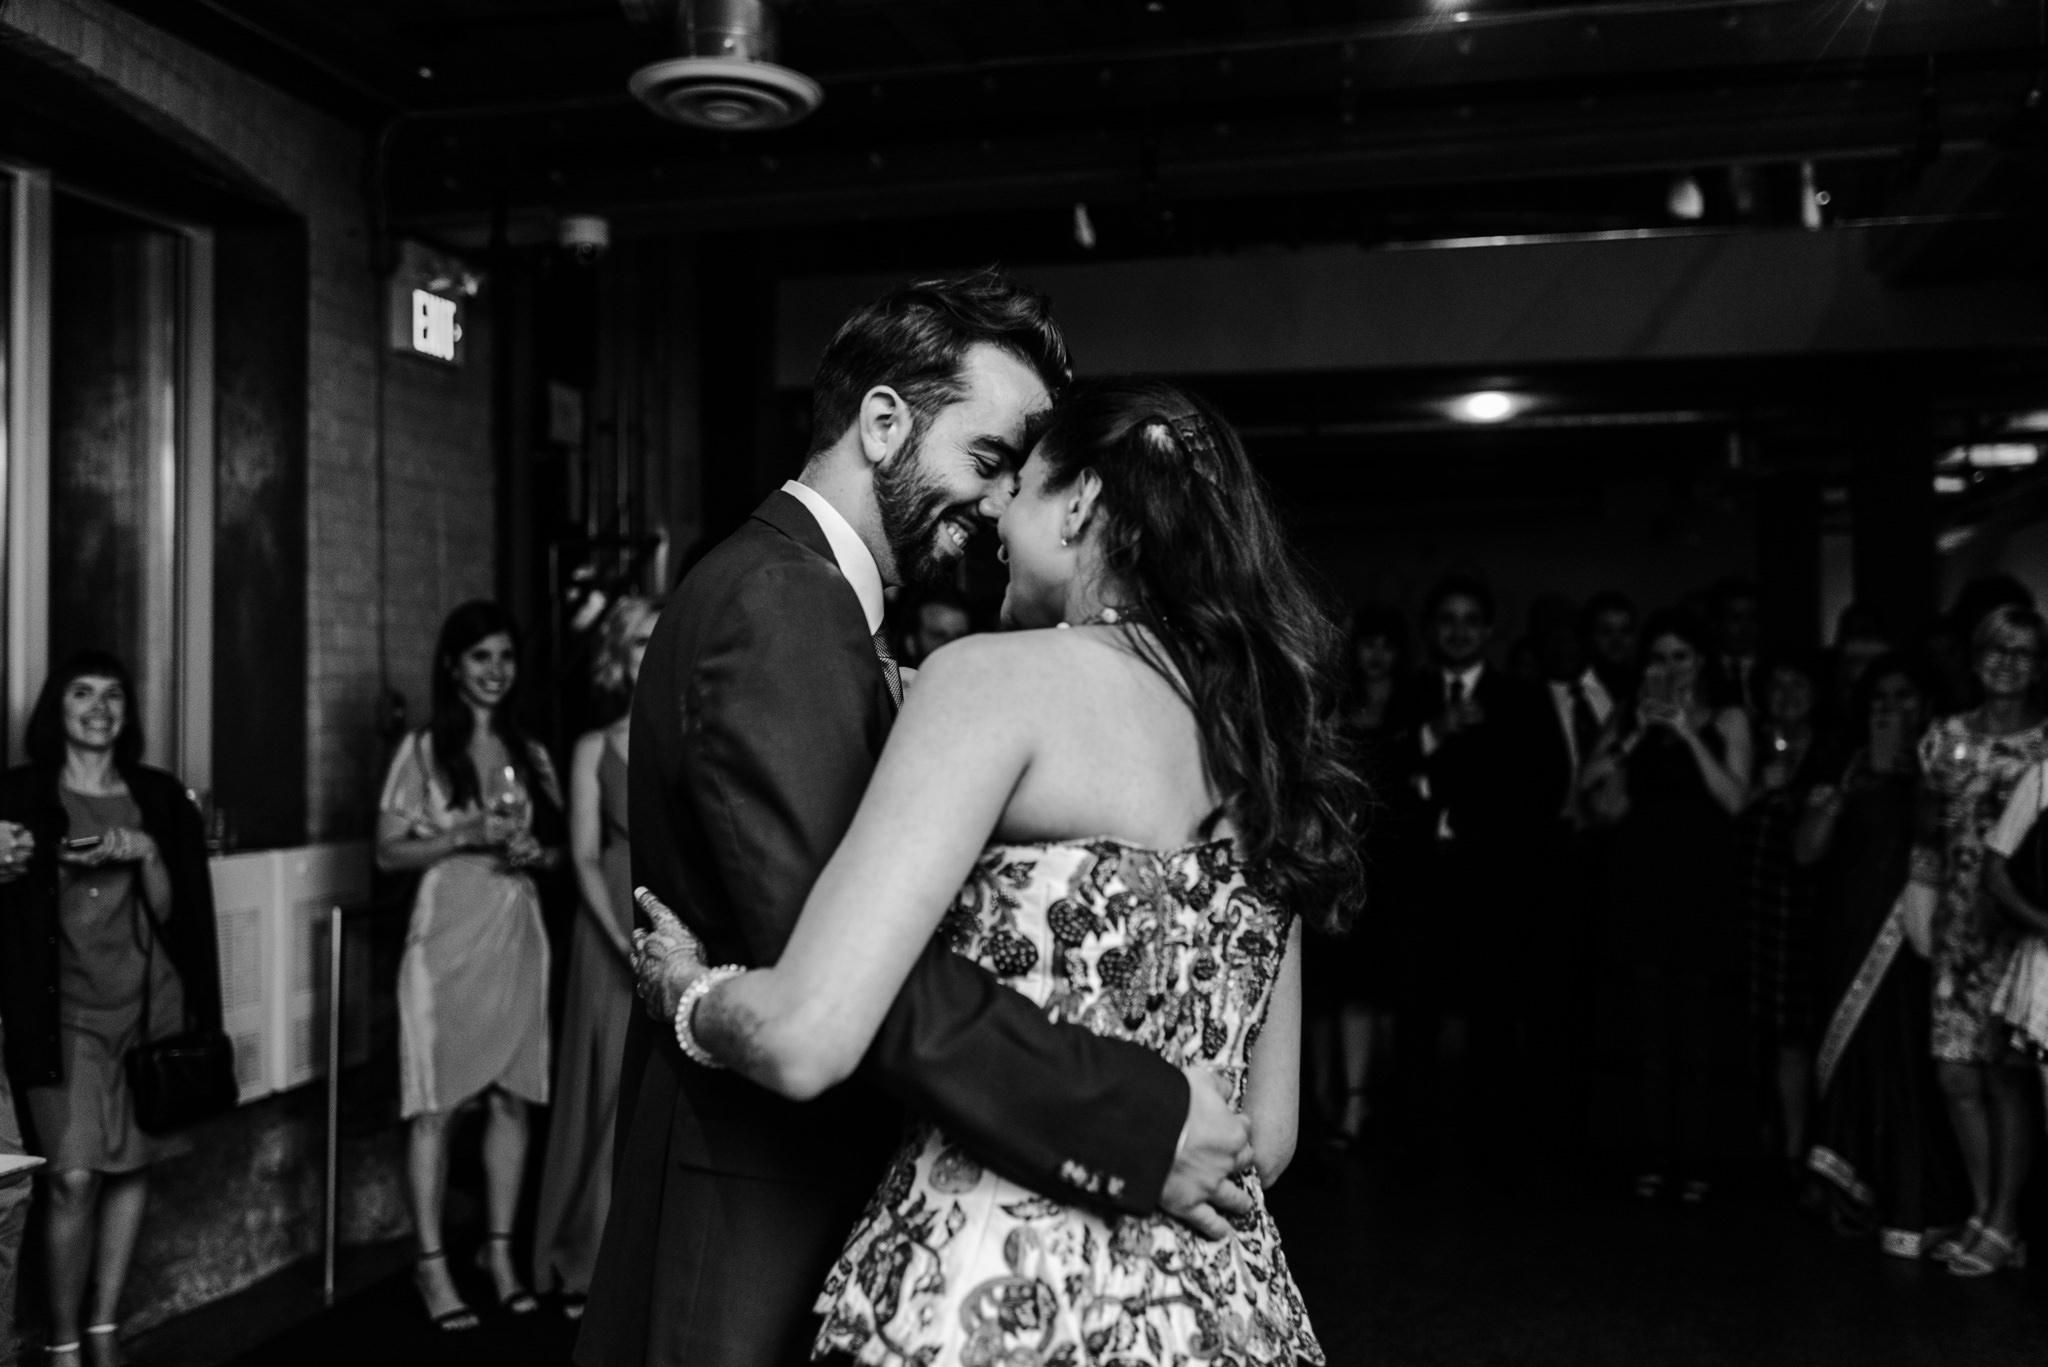 038-first-dance-hotel-ocho-wedding-photographer-toronto-documentary.jpg